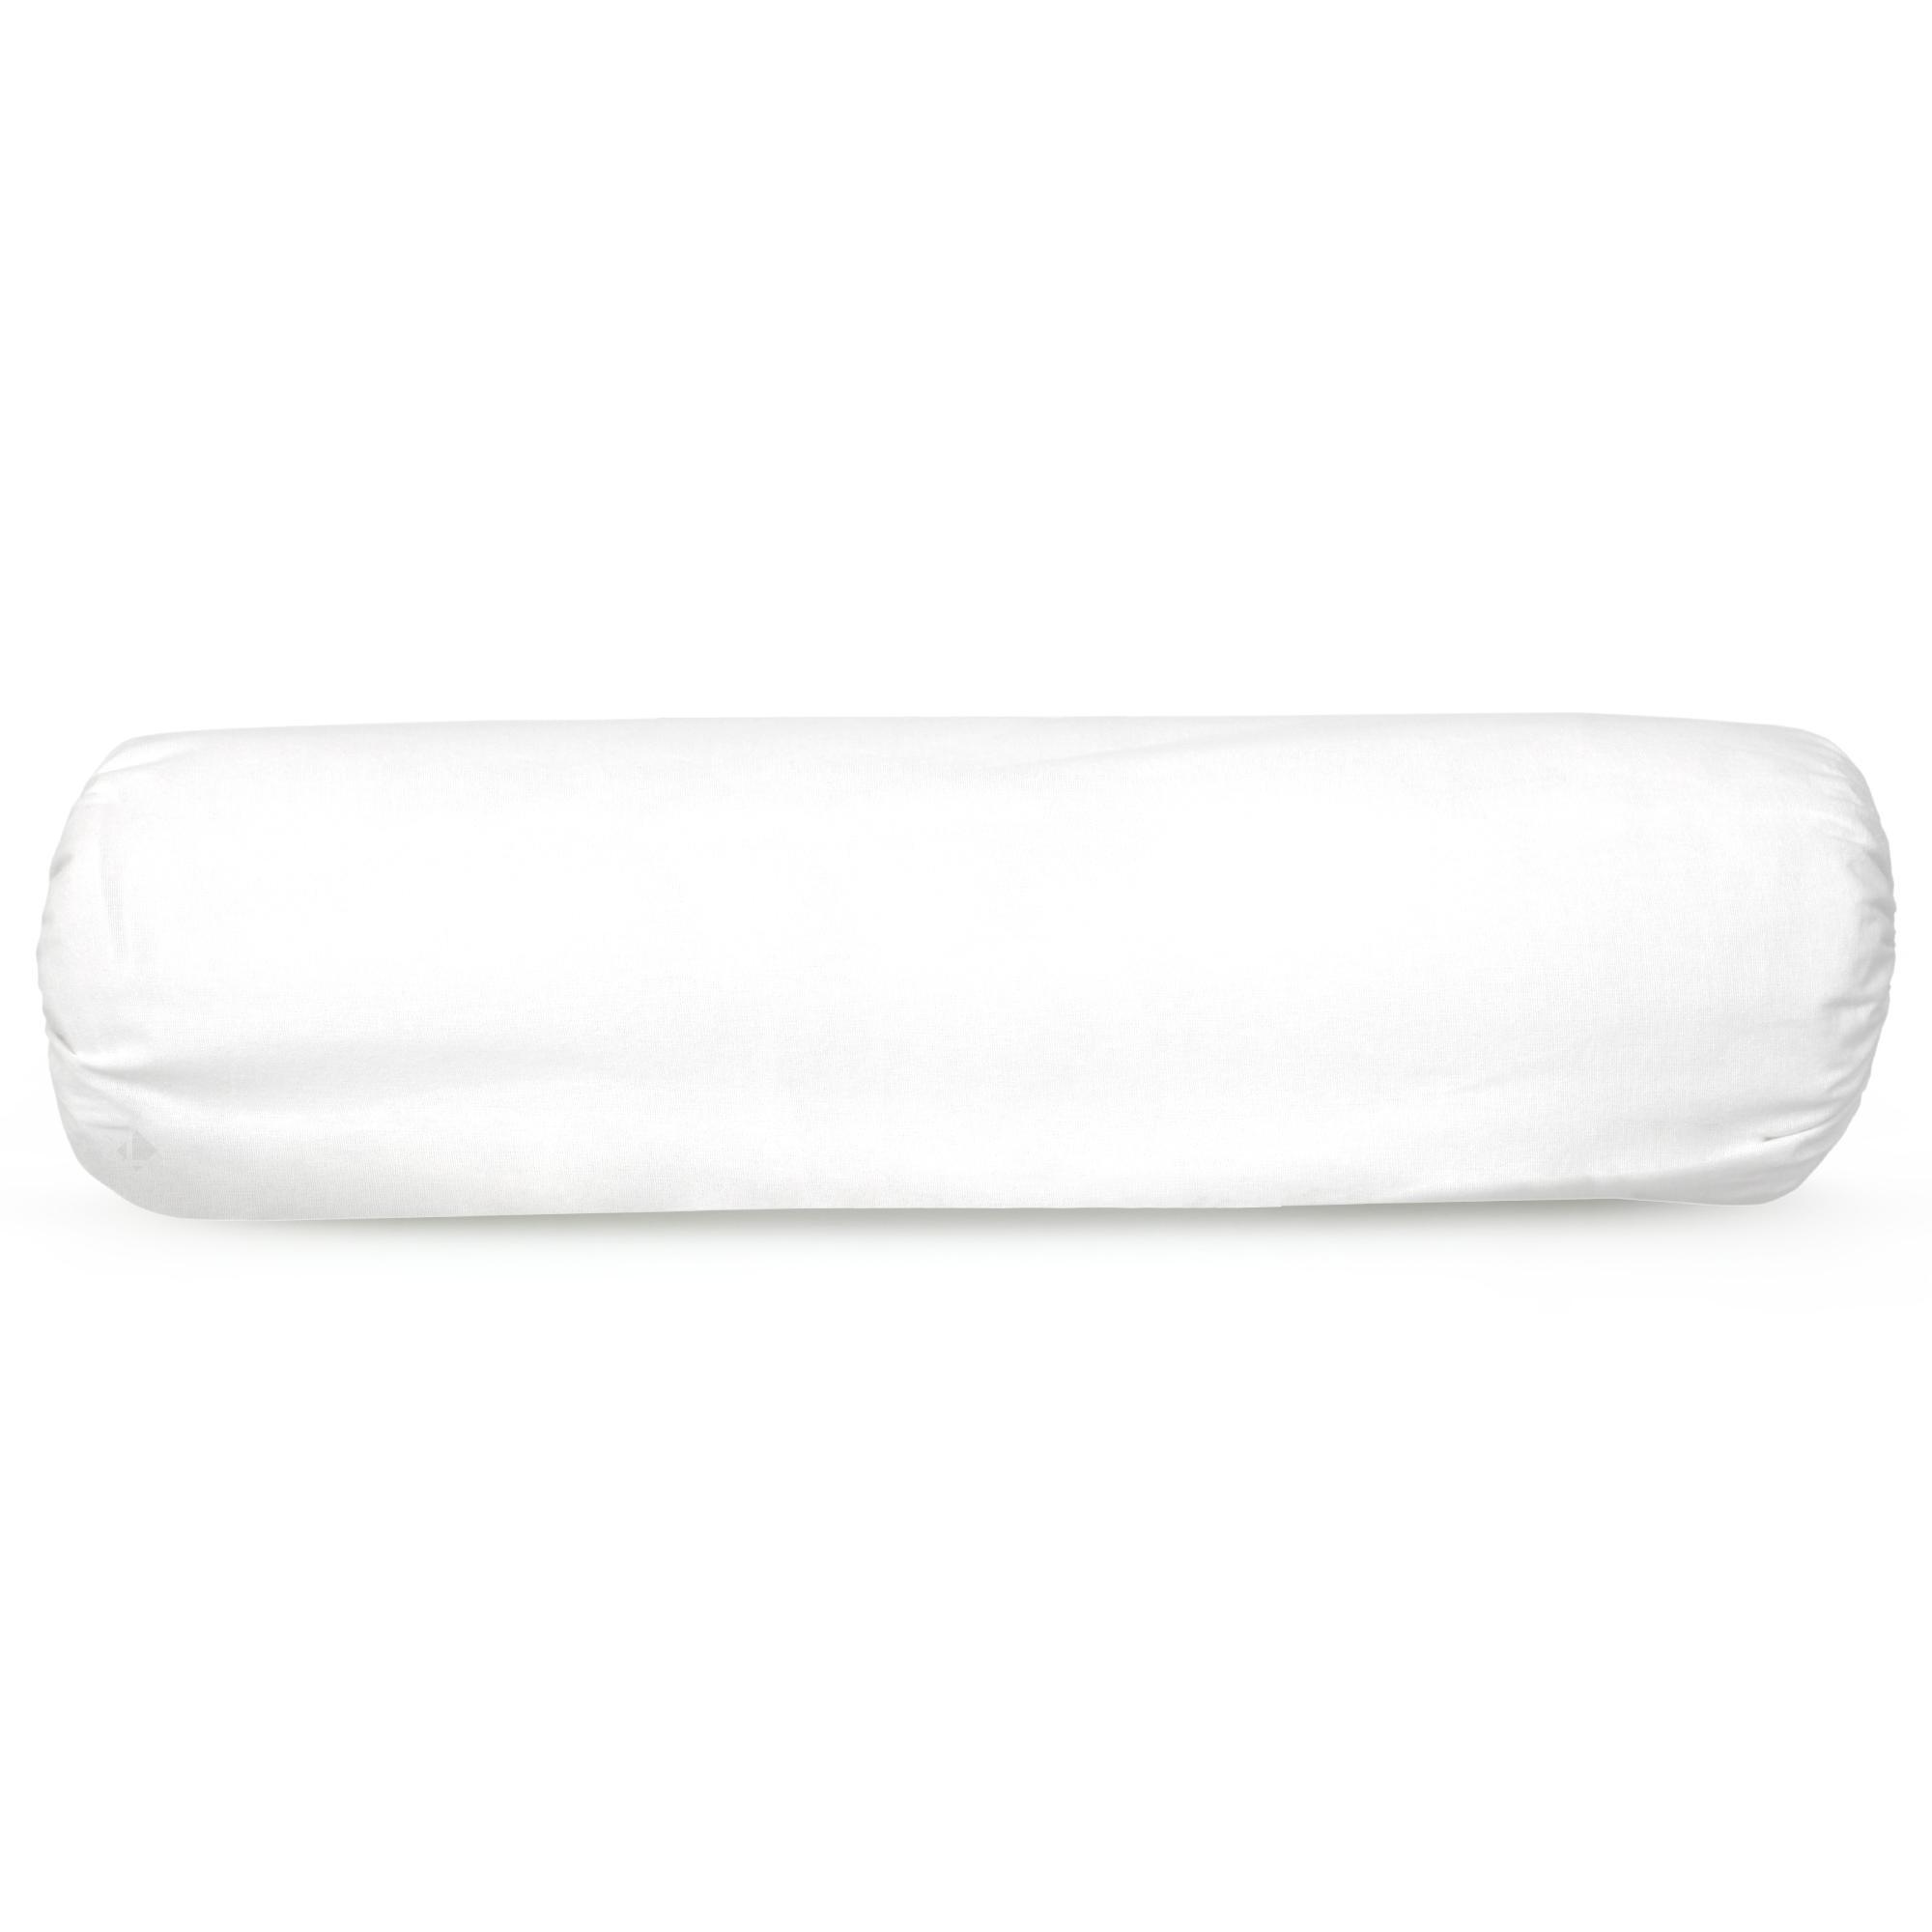 housse de protection de traversin imperm able 90 cm arnon molleton 100 coton contrecoll. Black Bedroom Furniture Sets. Home Design Ideas